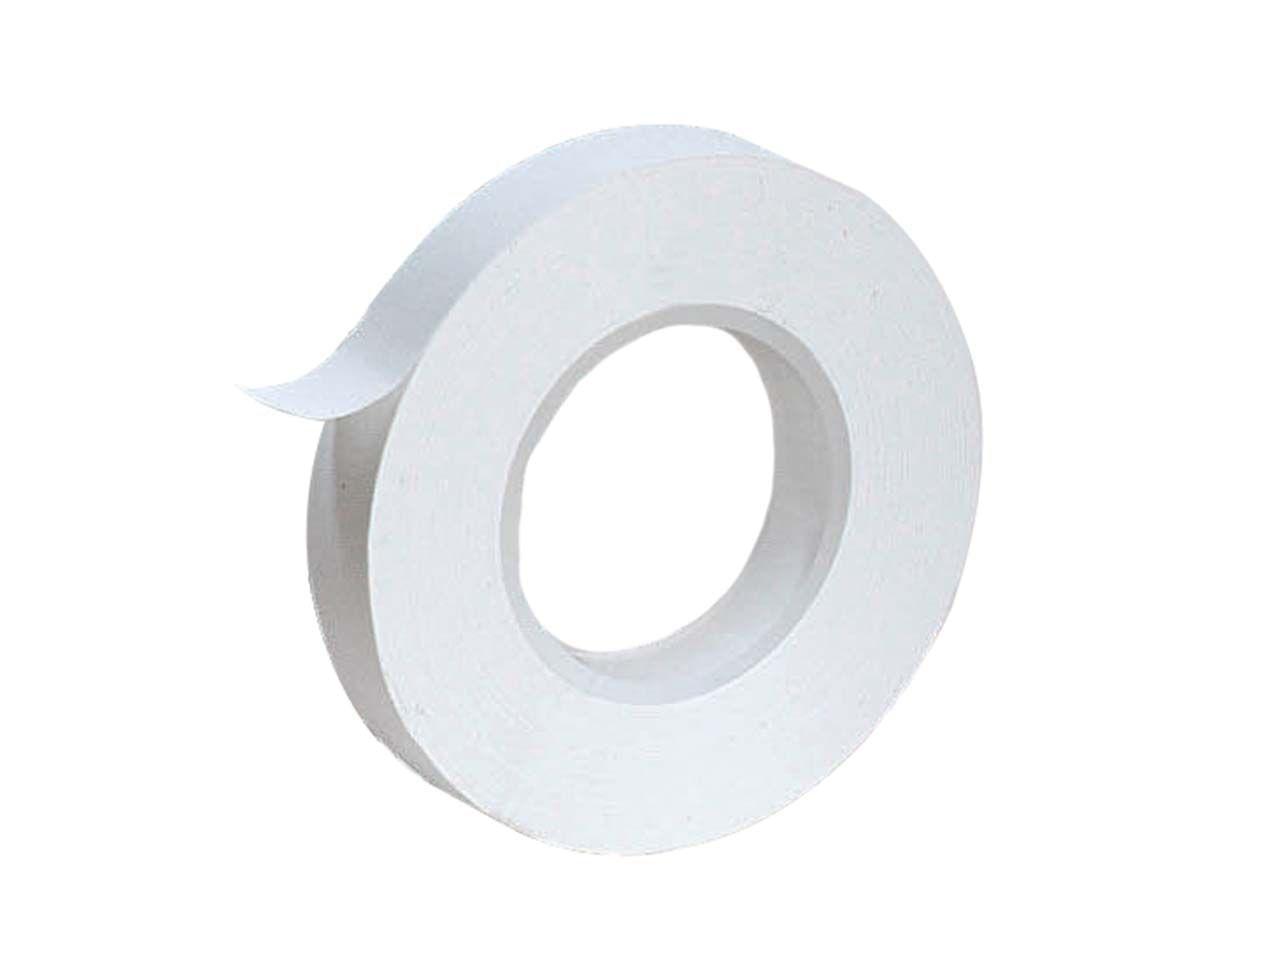 Korrekturband 8,4 mm x 17 m, weiß 2040